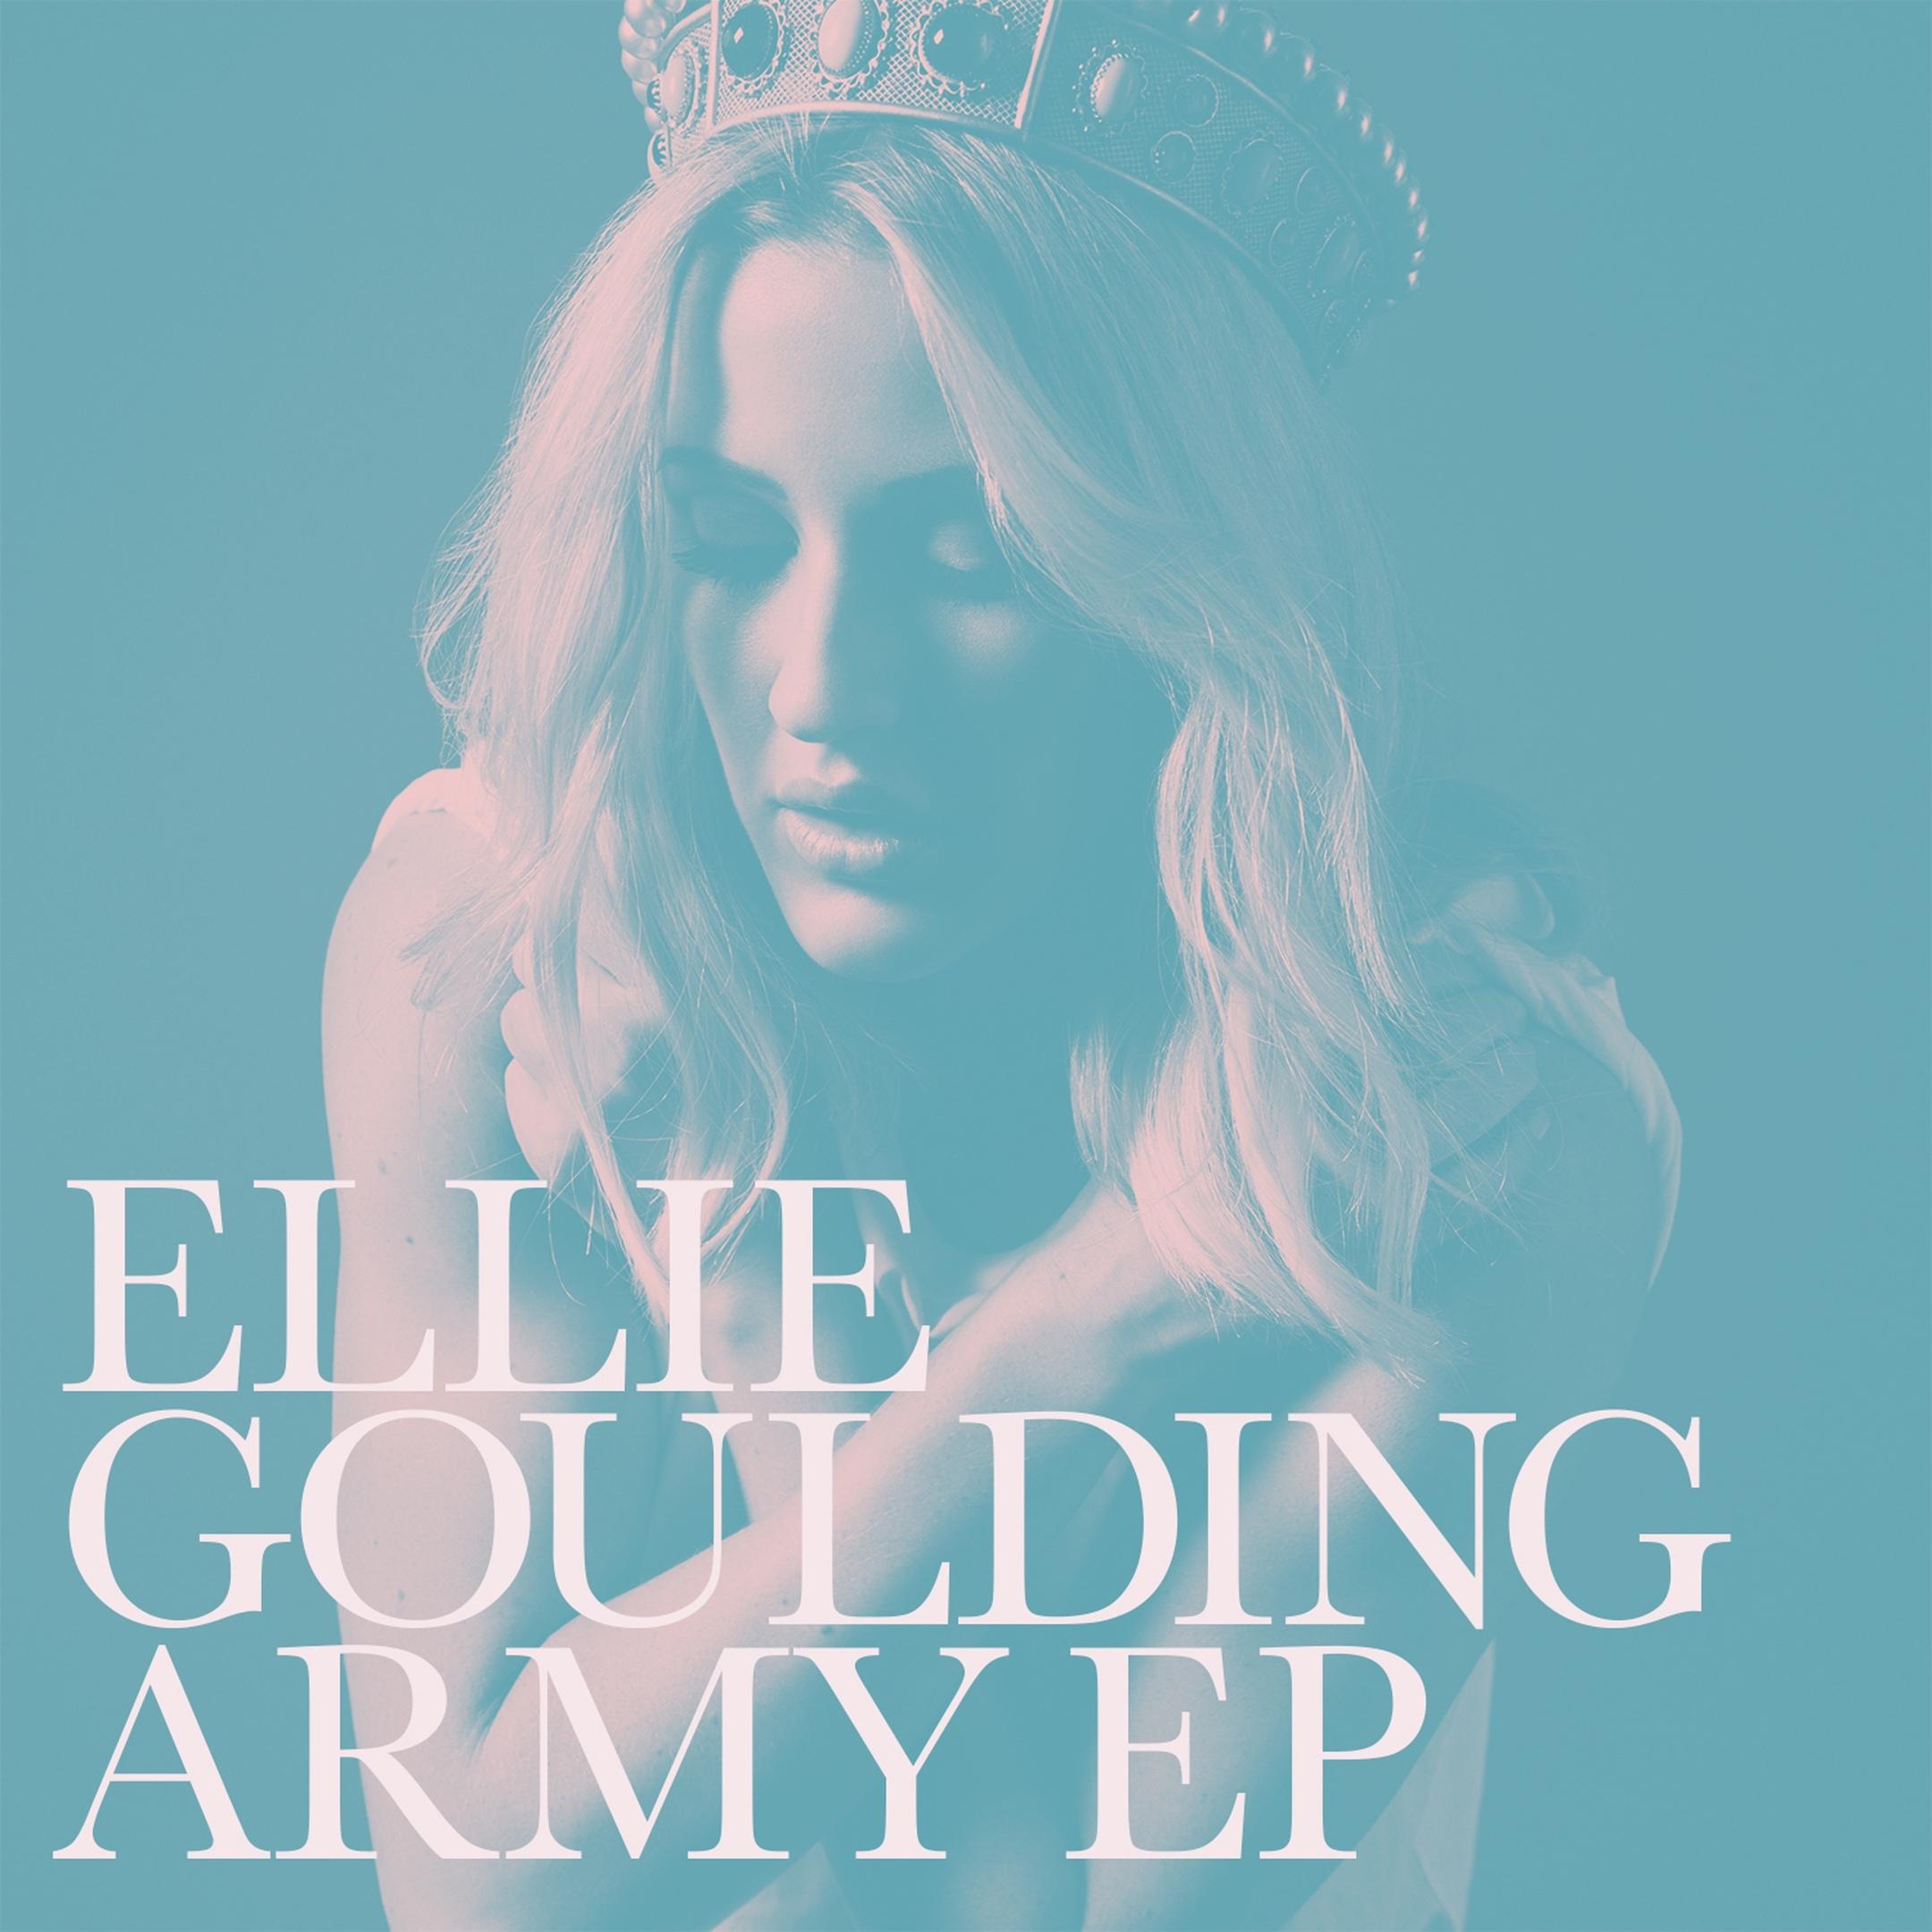 Ellie Goulding album Army - EP